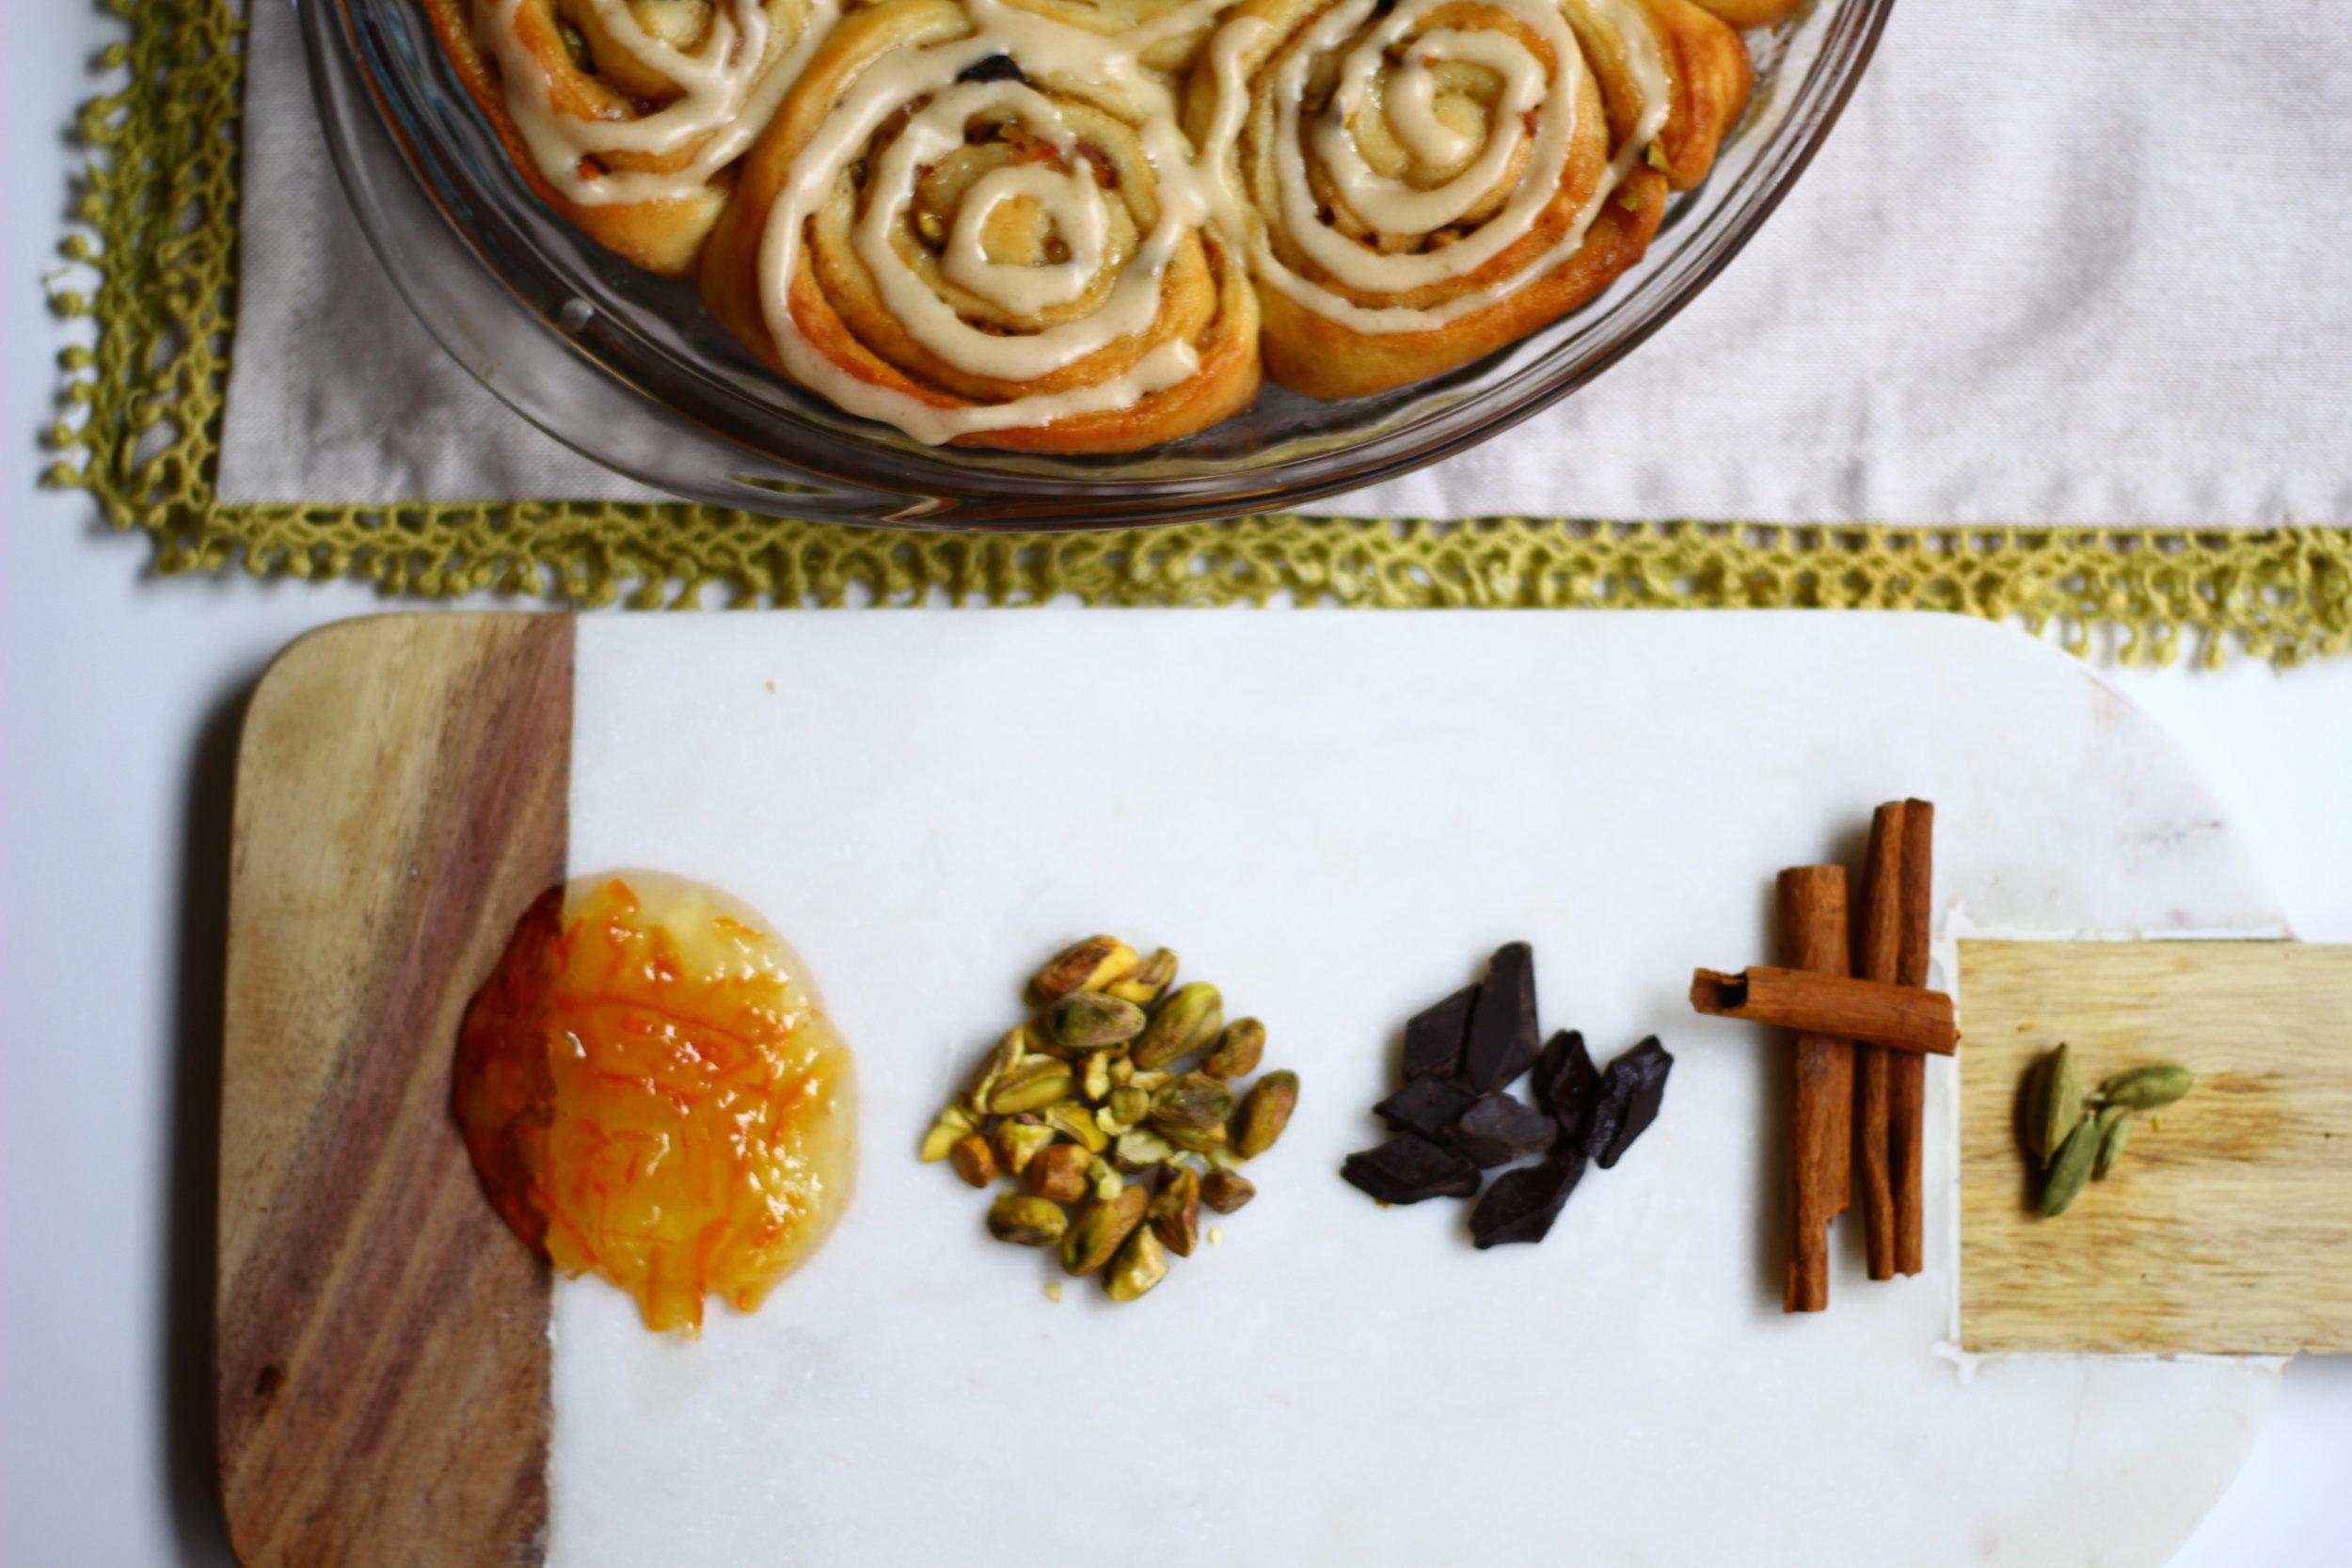 SWEET ORANGE ROLLS WITH CARDAMOM, CHOCOLATE, AND PISTACHIO